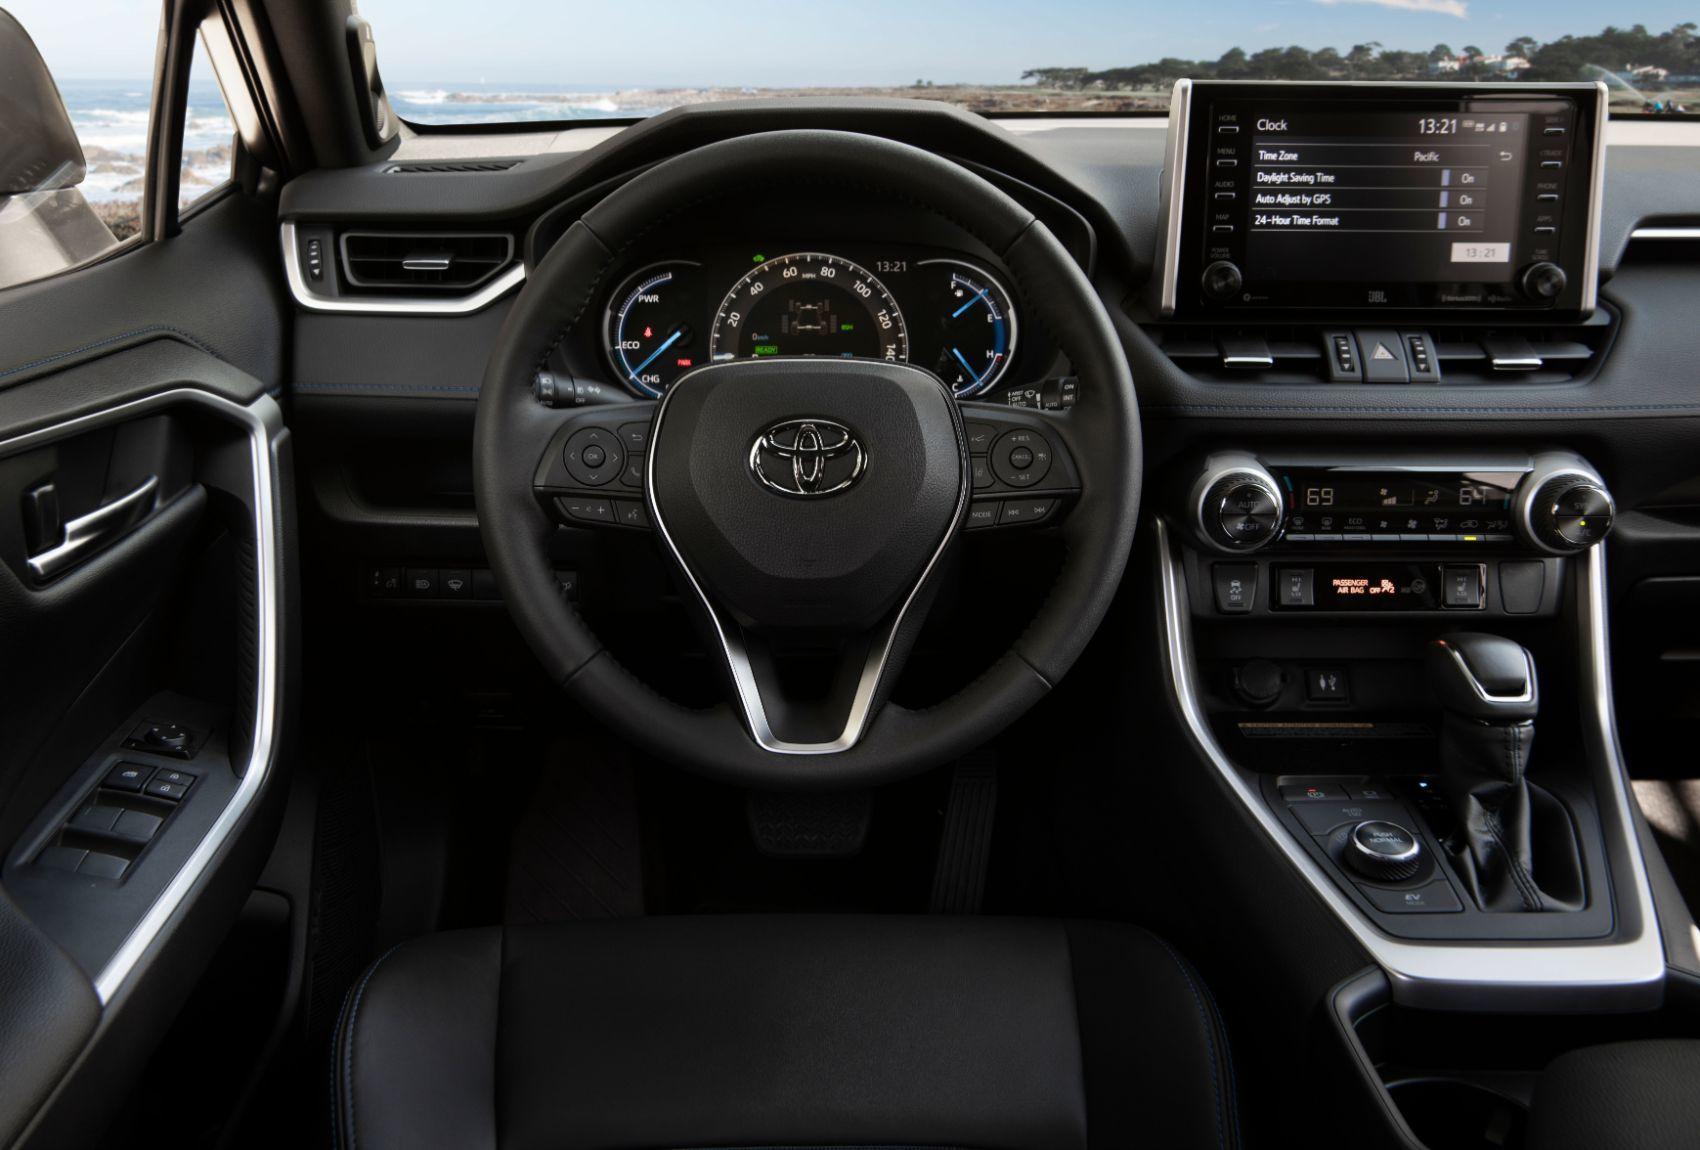 2020 Toyota Rav4 Hybrid Review Easy On The Gas Hard On The Eyes